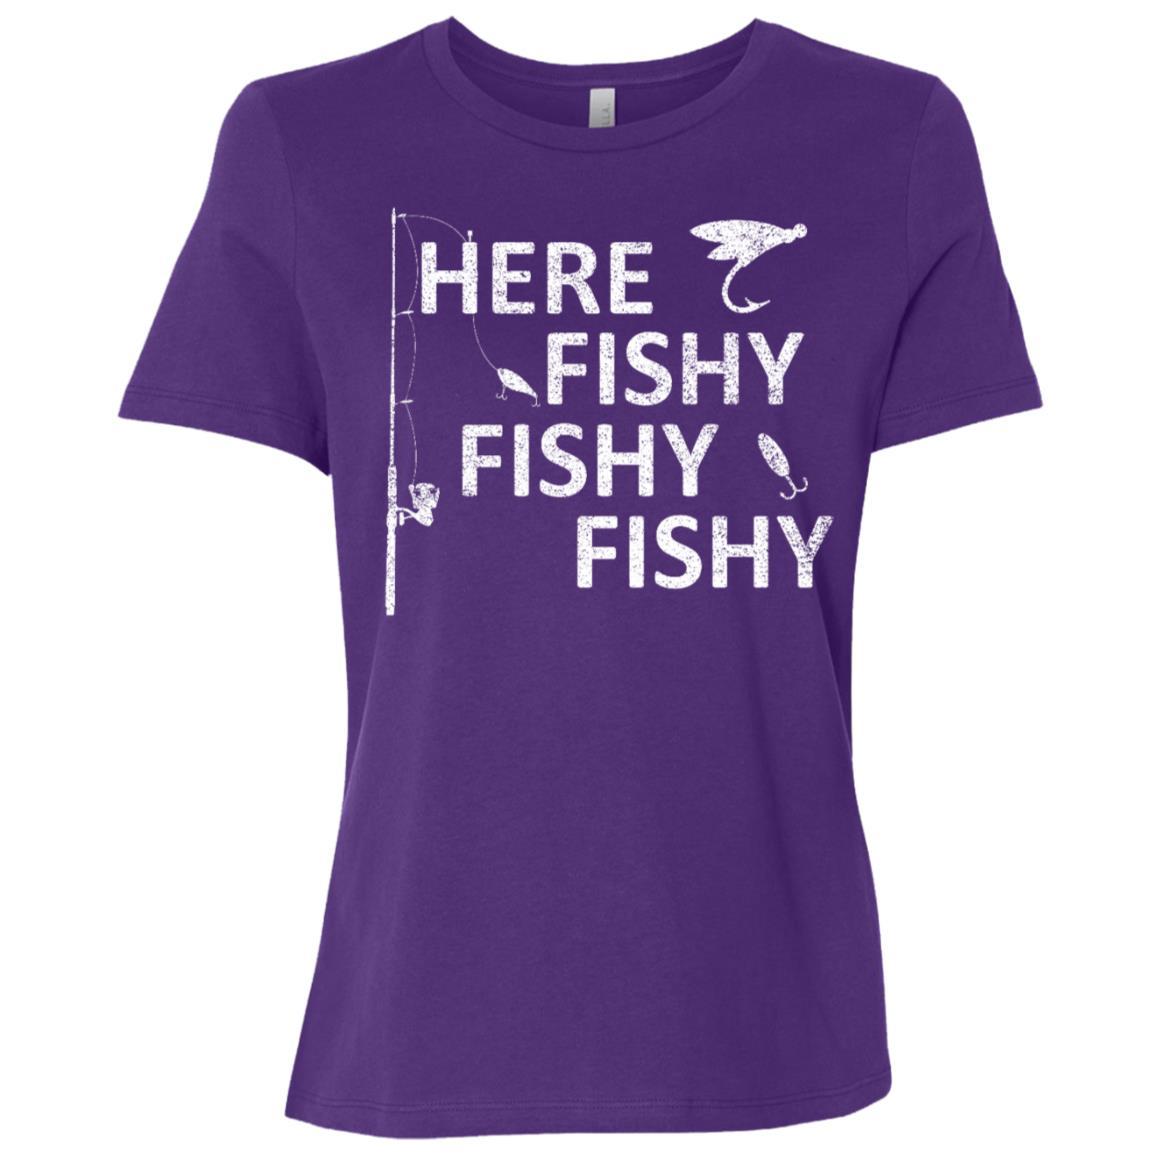 Here Fishy Fishy Fishy Funny Fisherman Women Short Sleeve T-Shirt